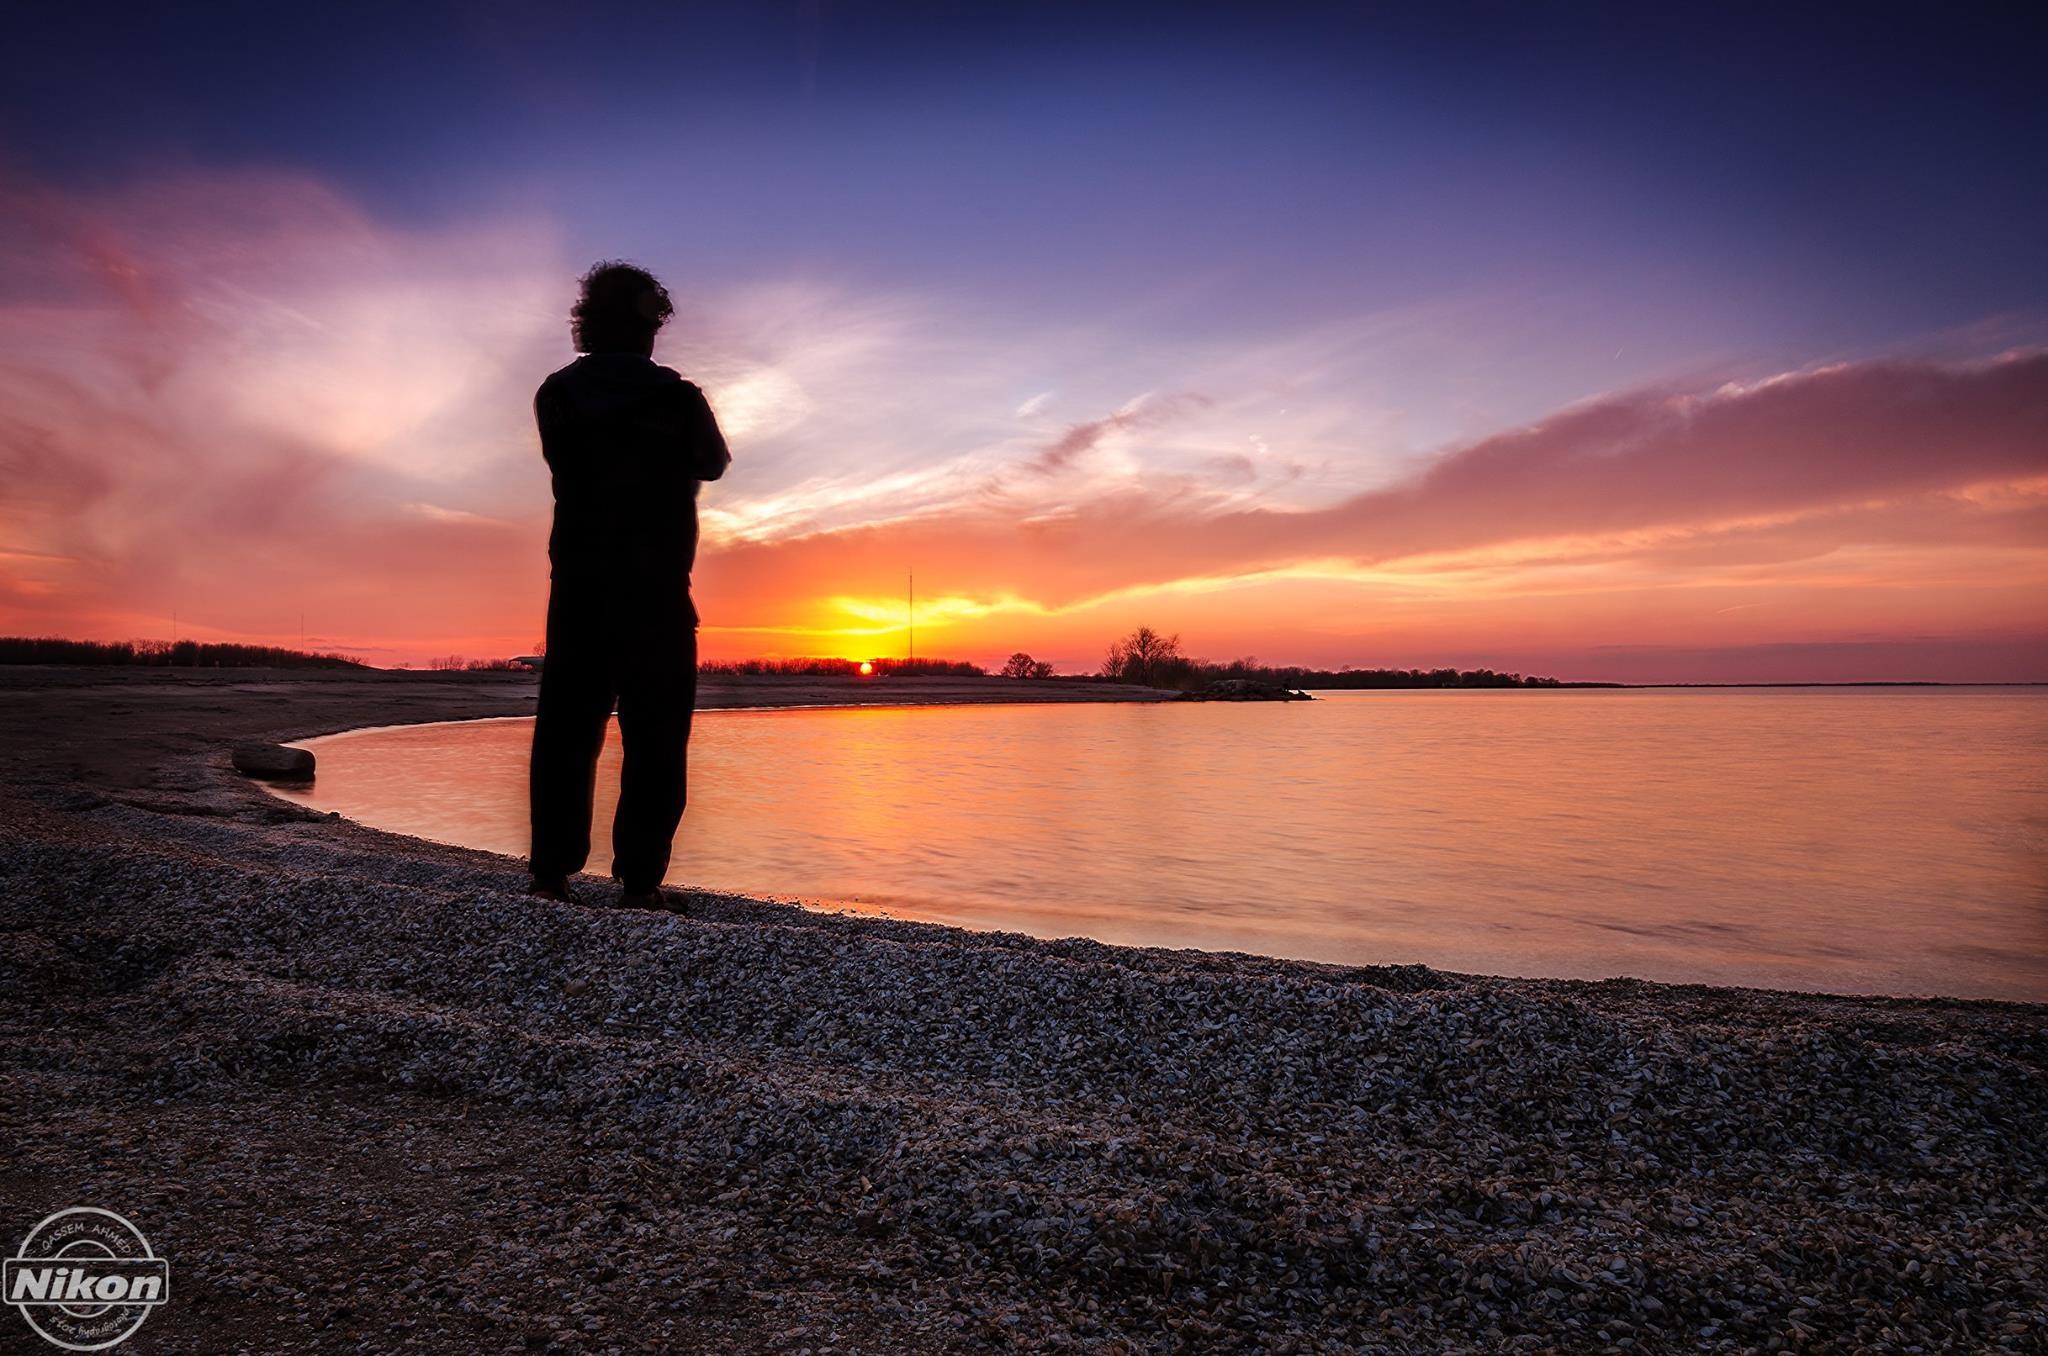 I waiting the sunset by Qassem Ahmed Alzarra